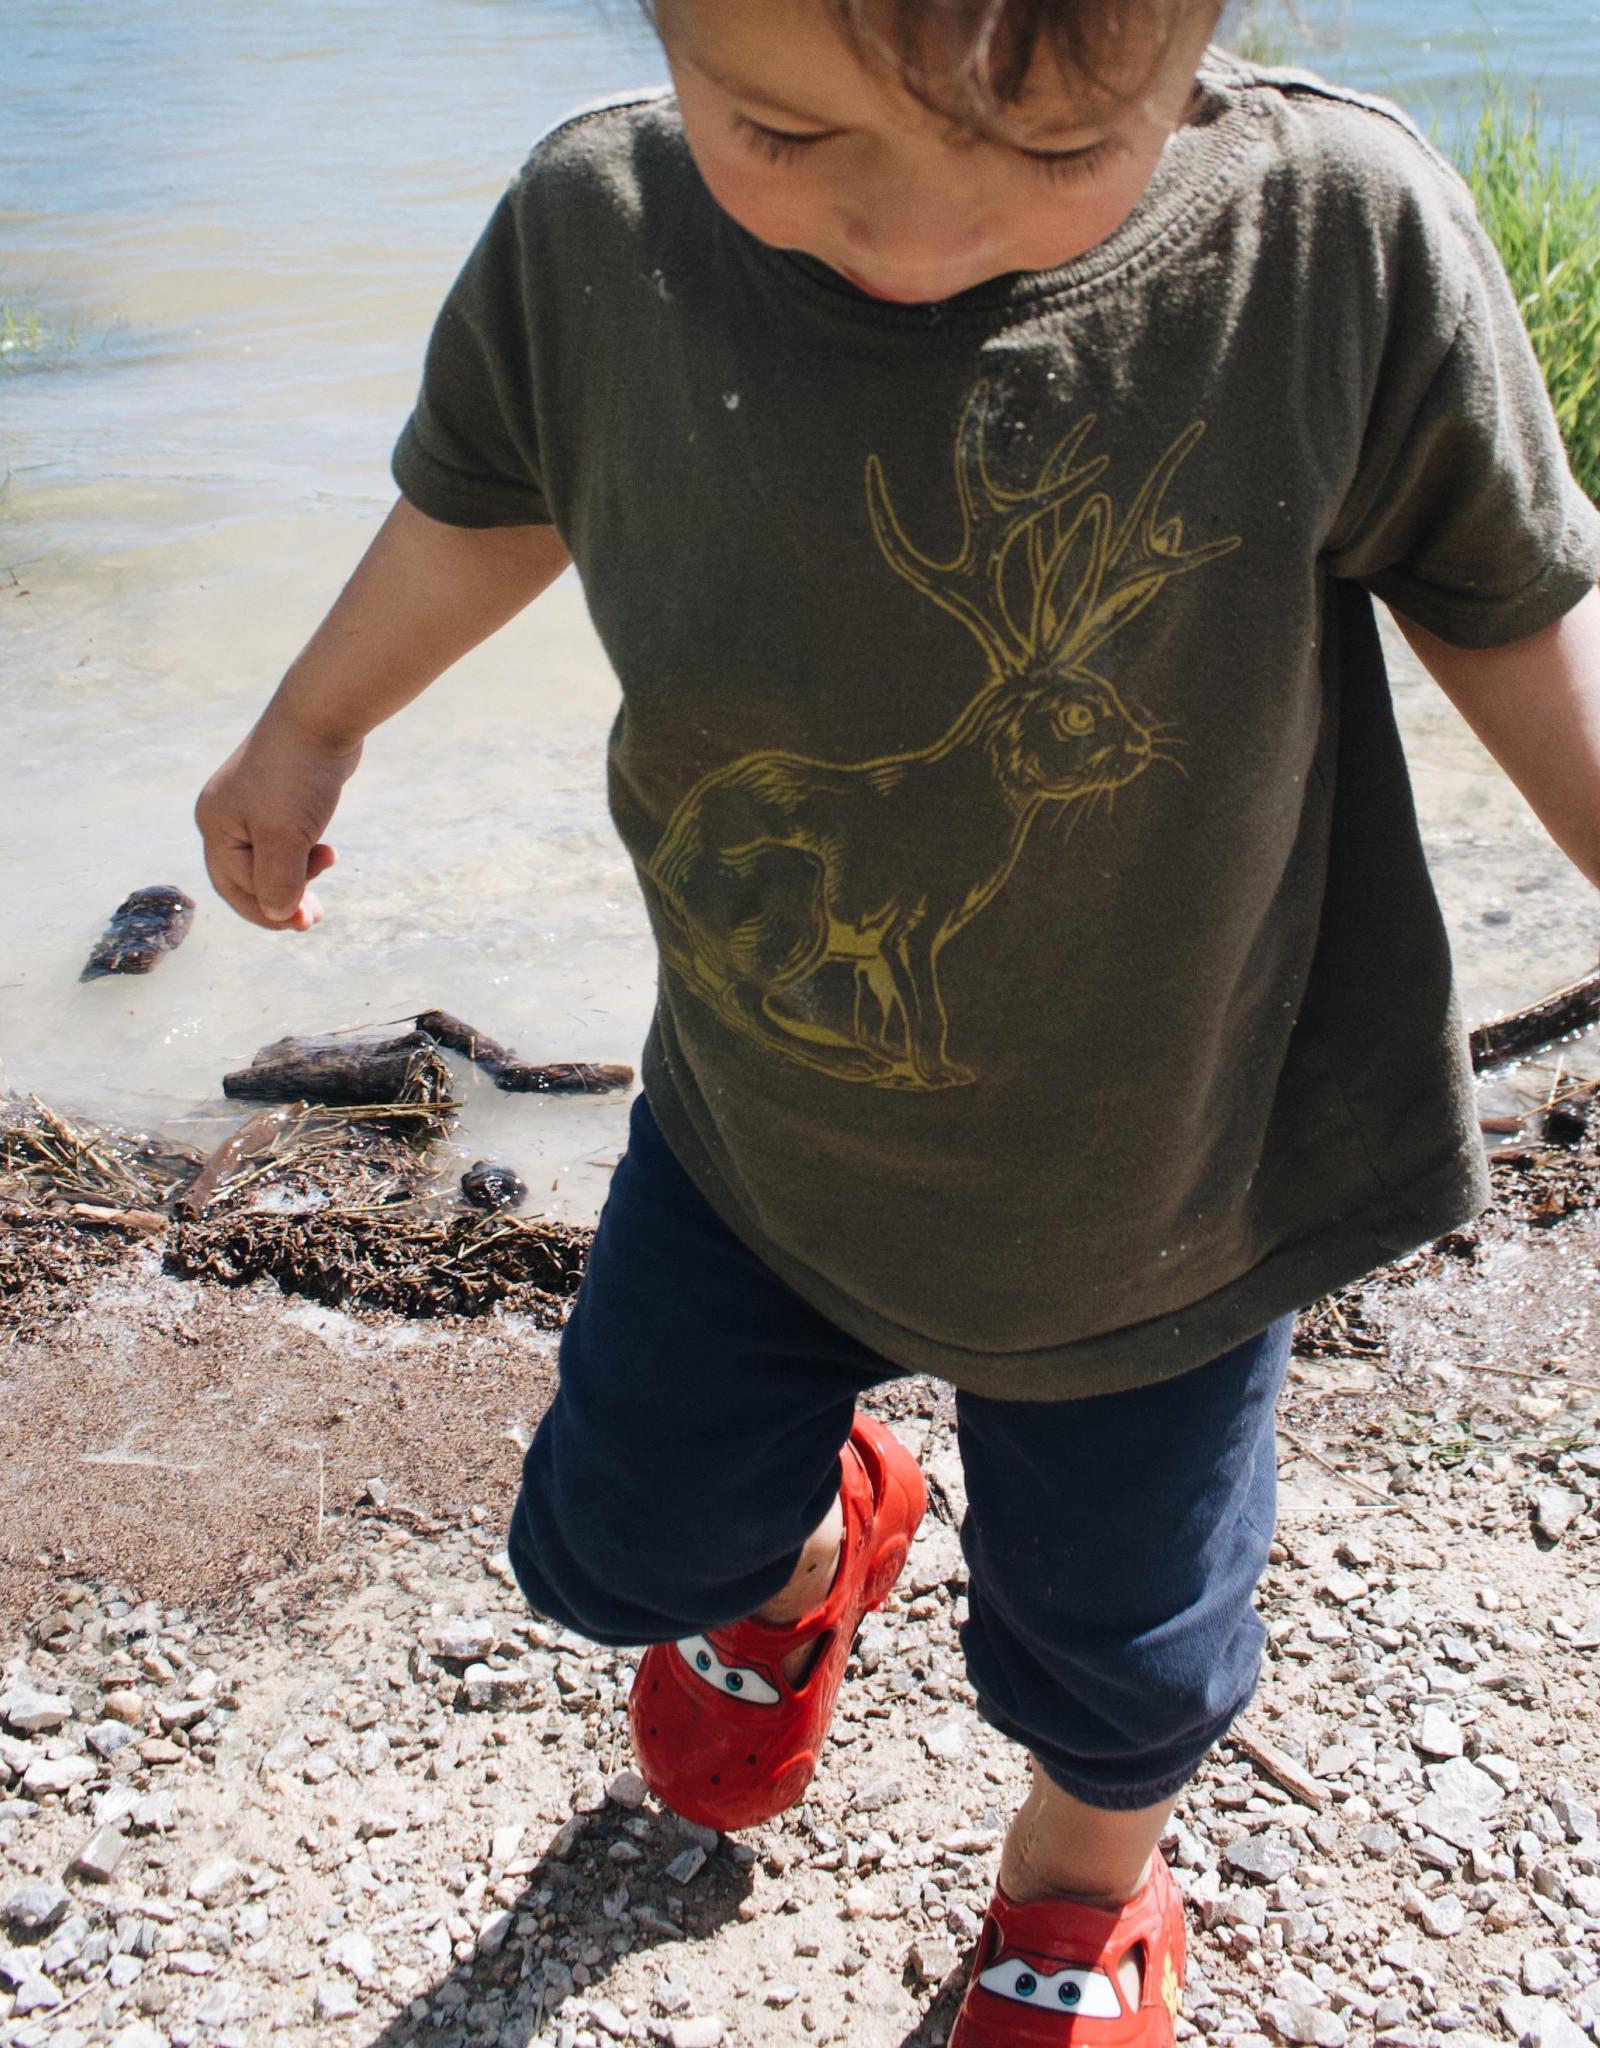 Jackalope Toddler Shirt